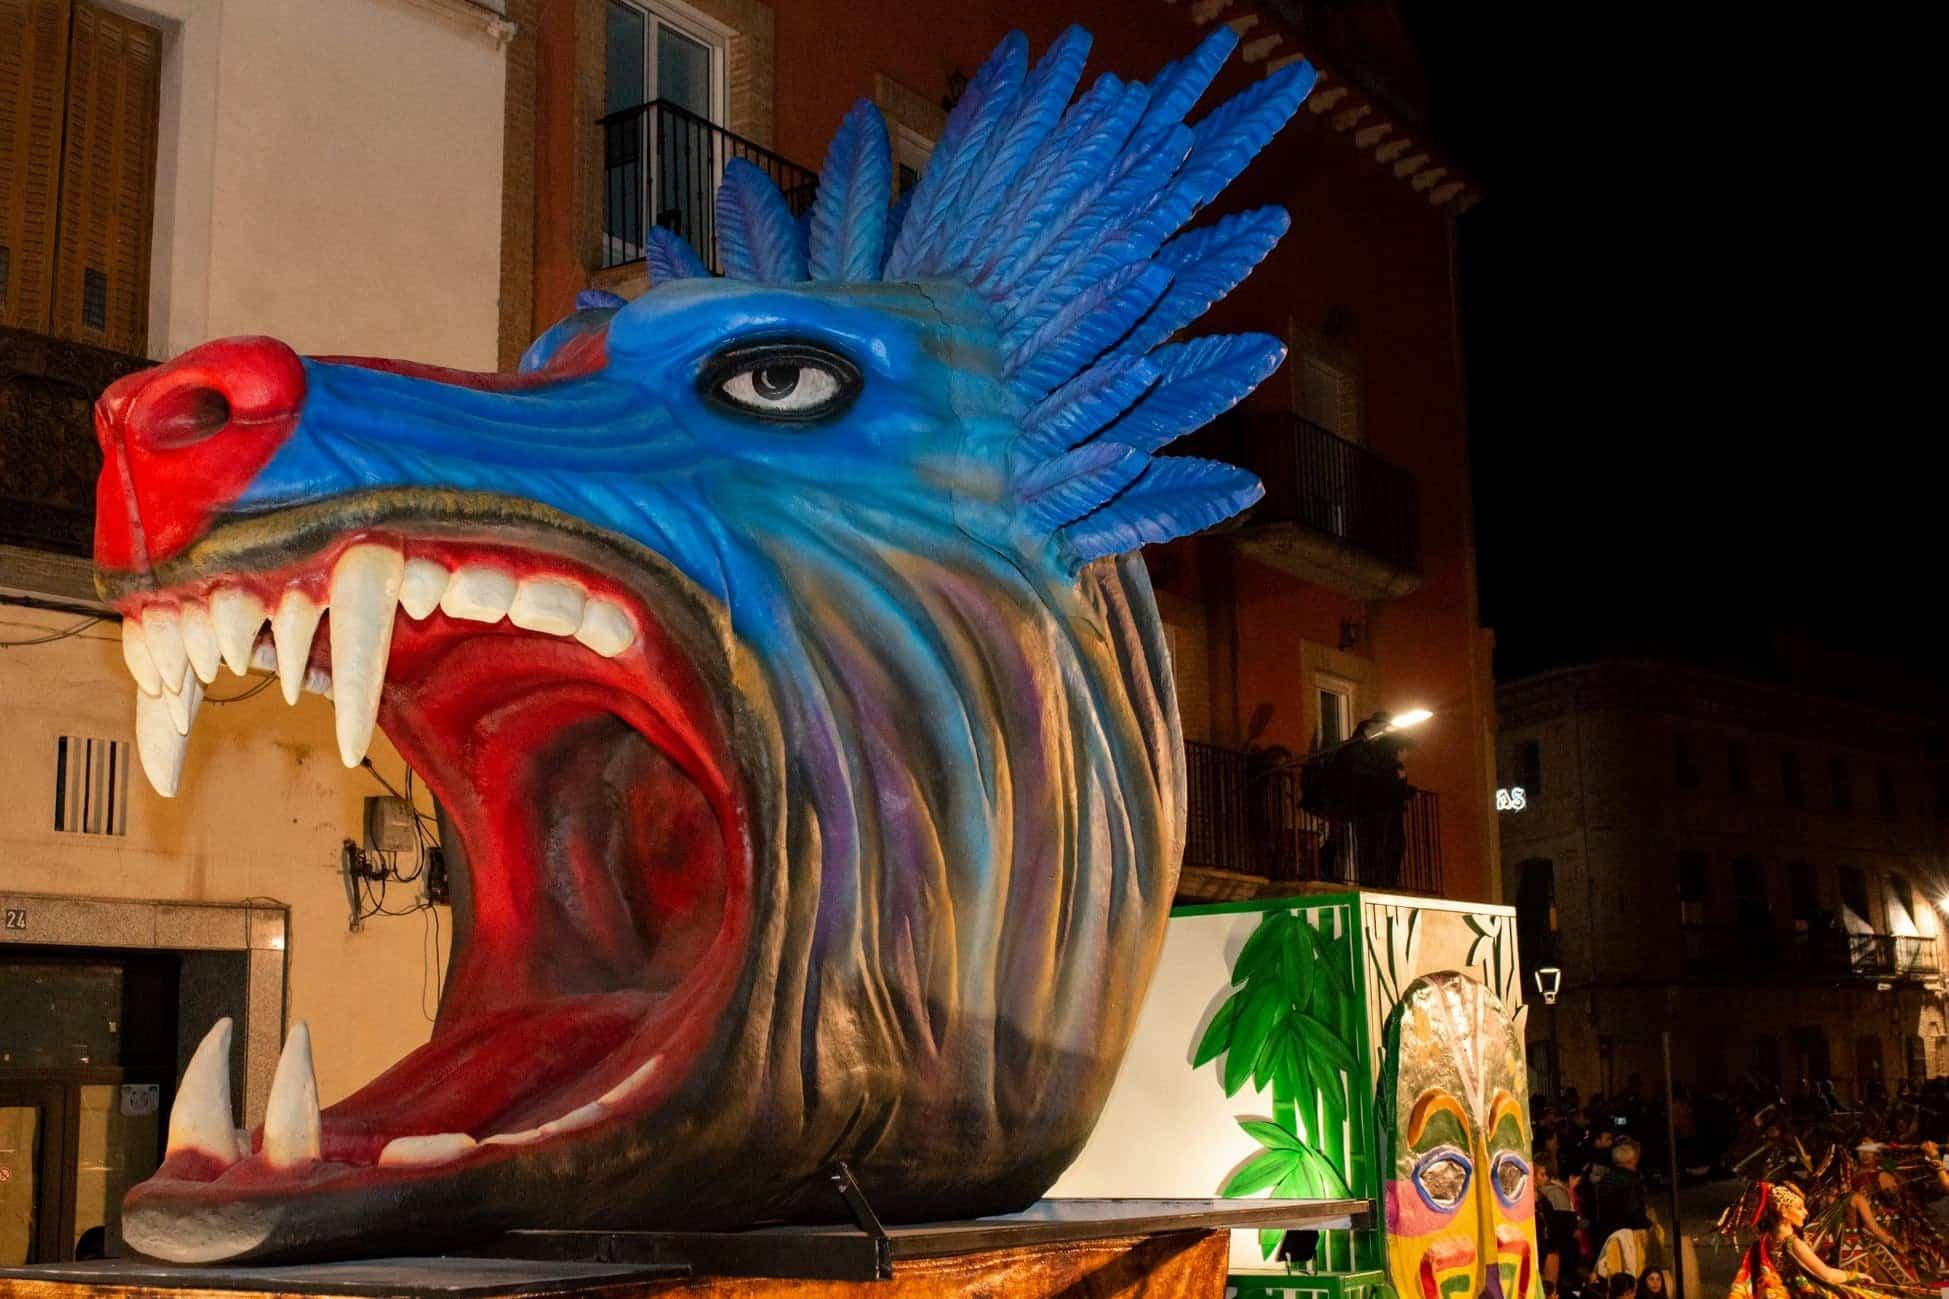 Carnaval de herencia 2020 ofertorio 109 - Selección de fotografías del Ofertorio del Carnaval de Herencia